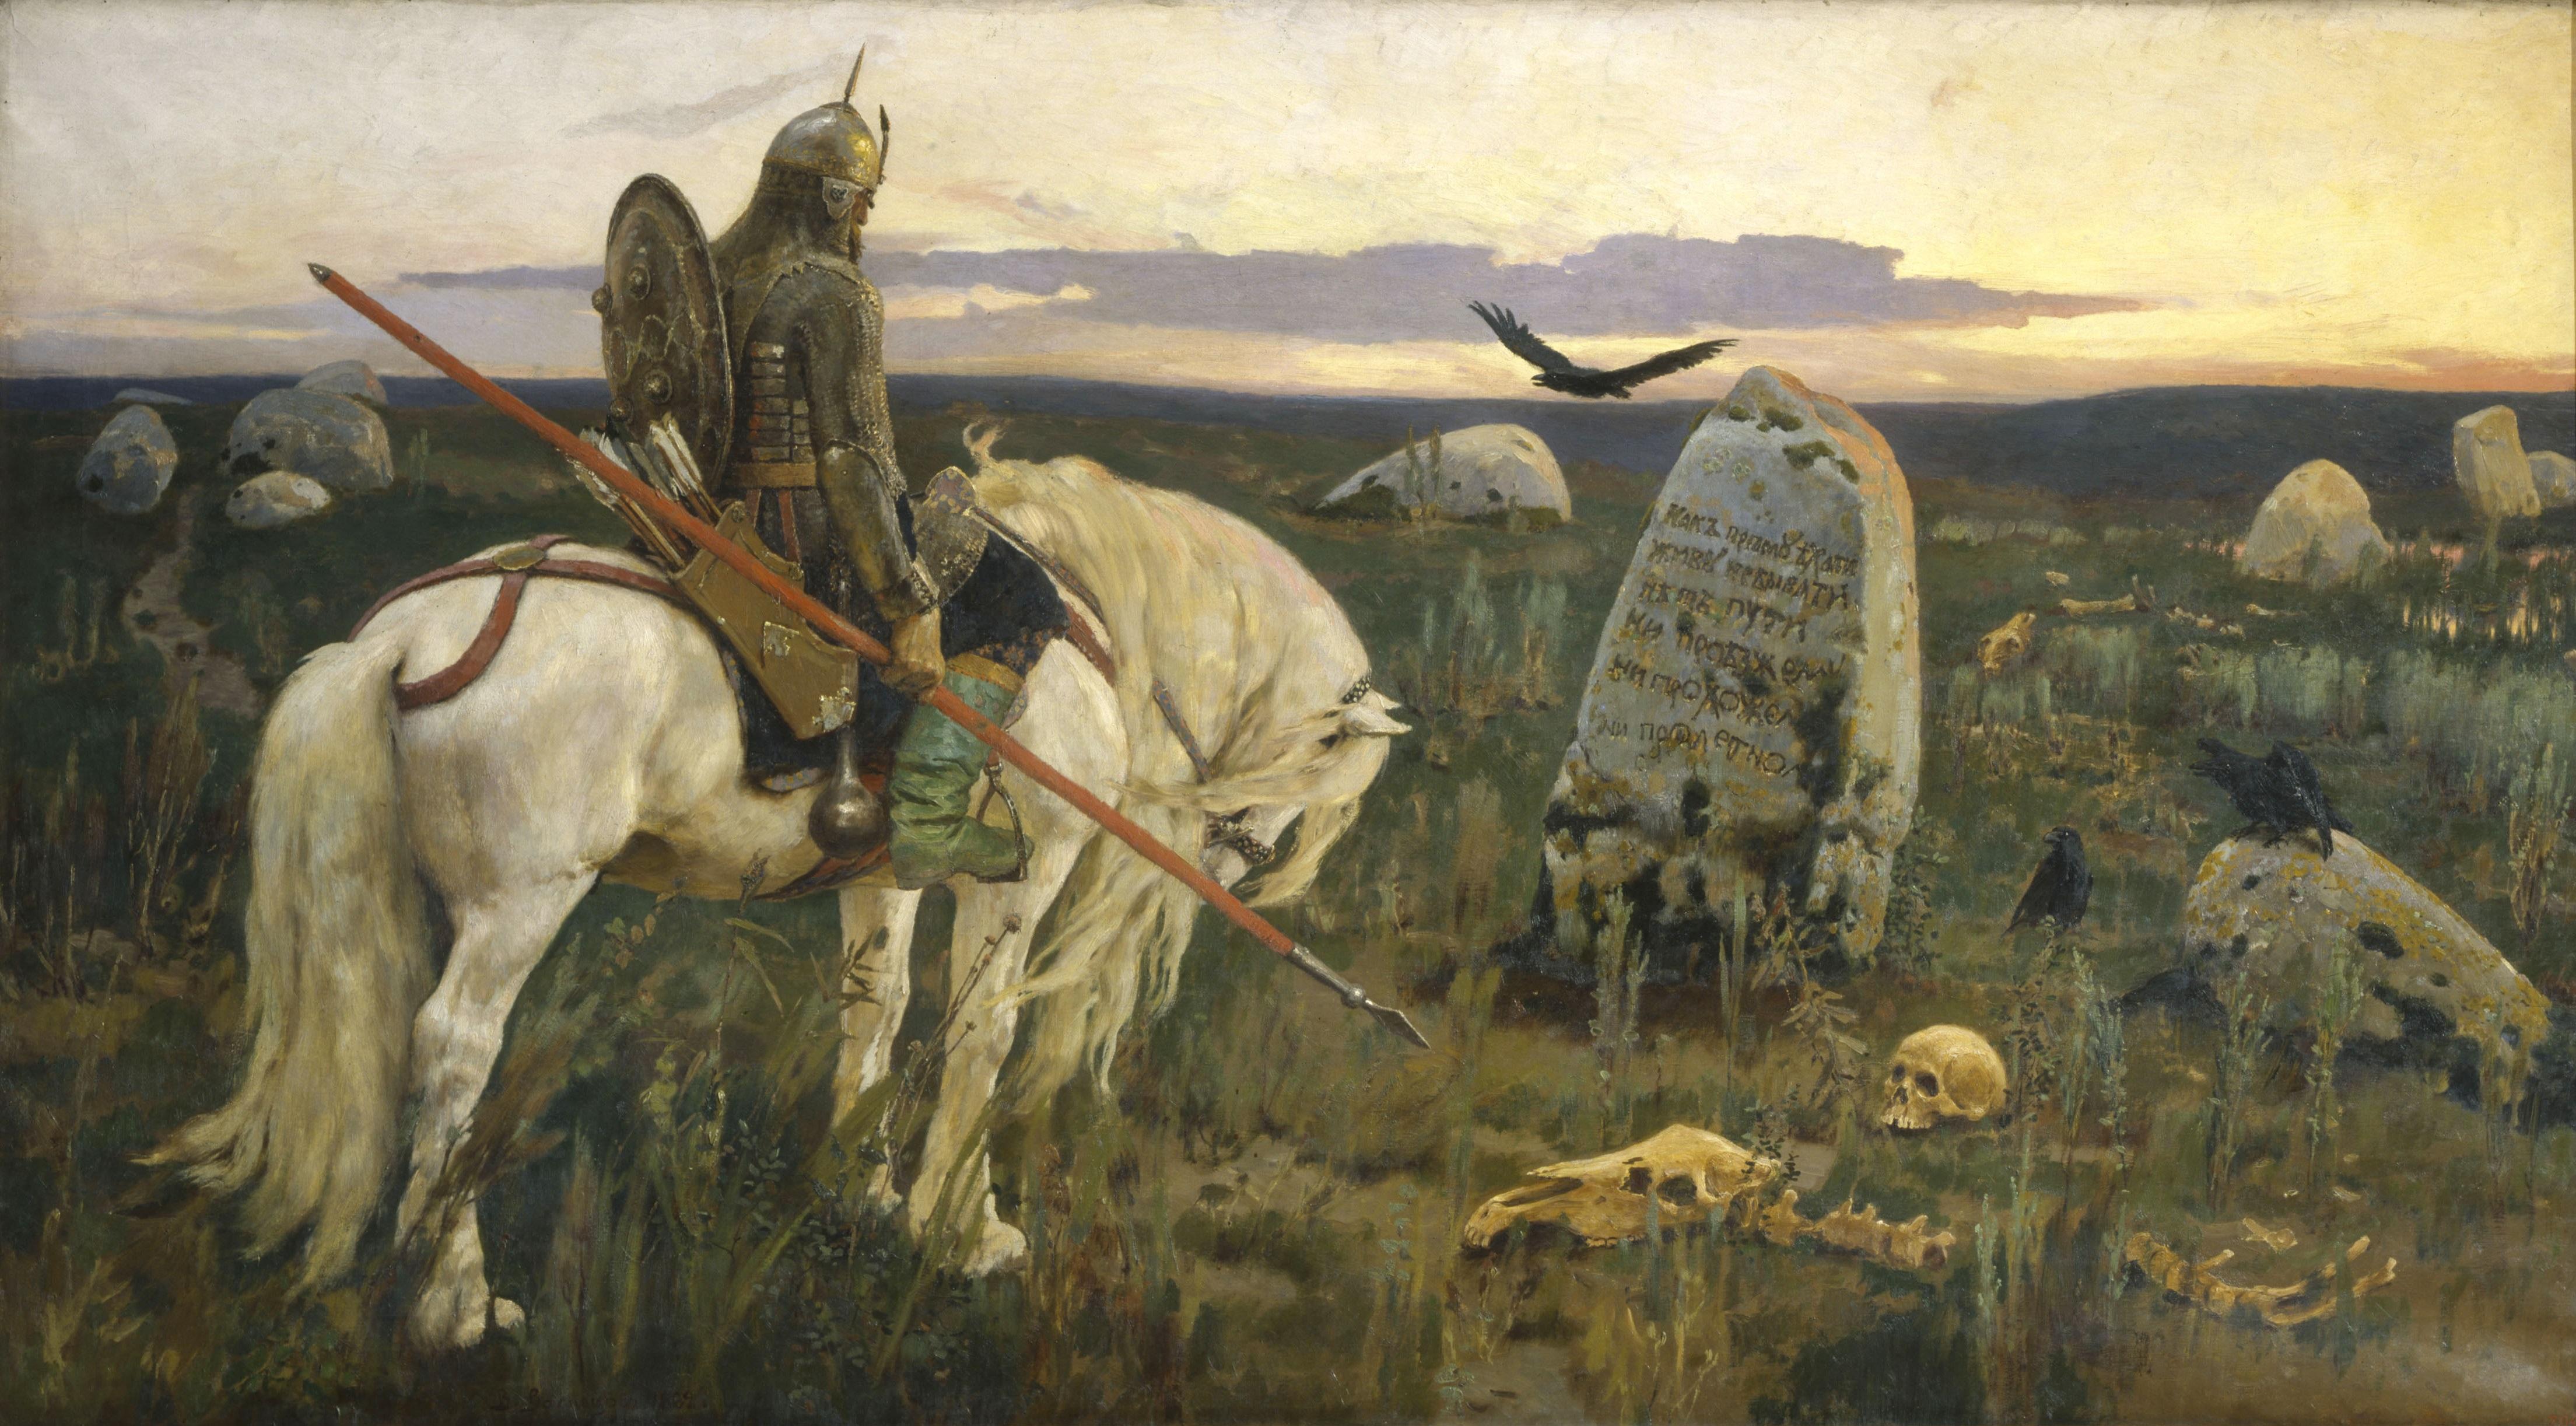 PZ 400:06 Inv 4214 Viktor Vasnetsov: Warrior at the Crossroads, 1882 The Russian Museum